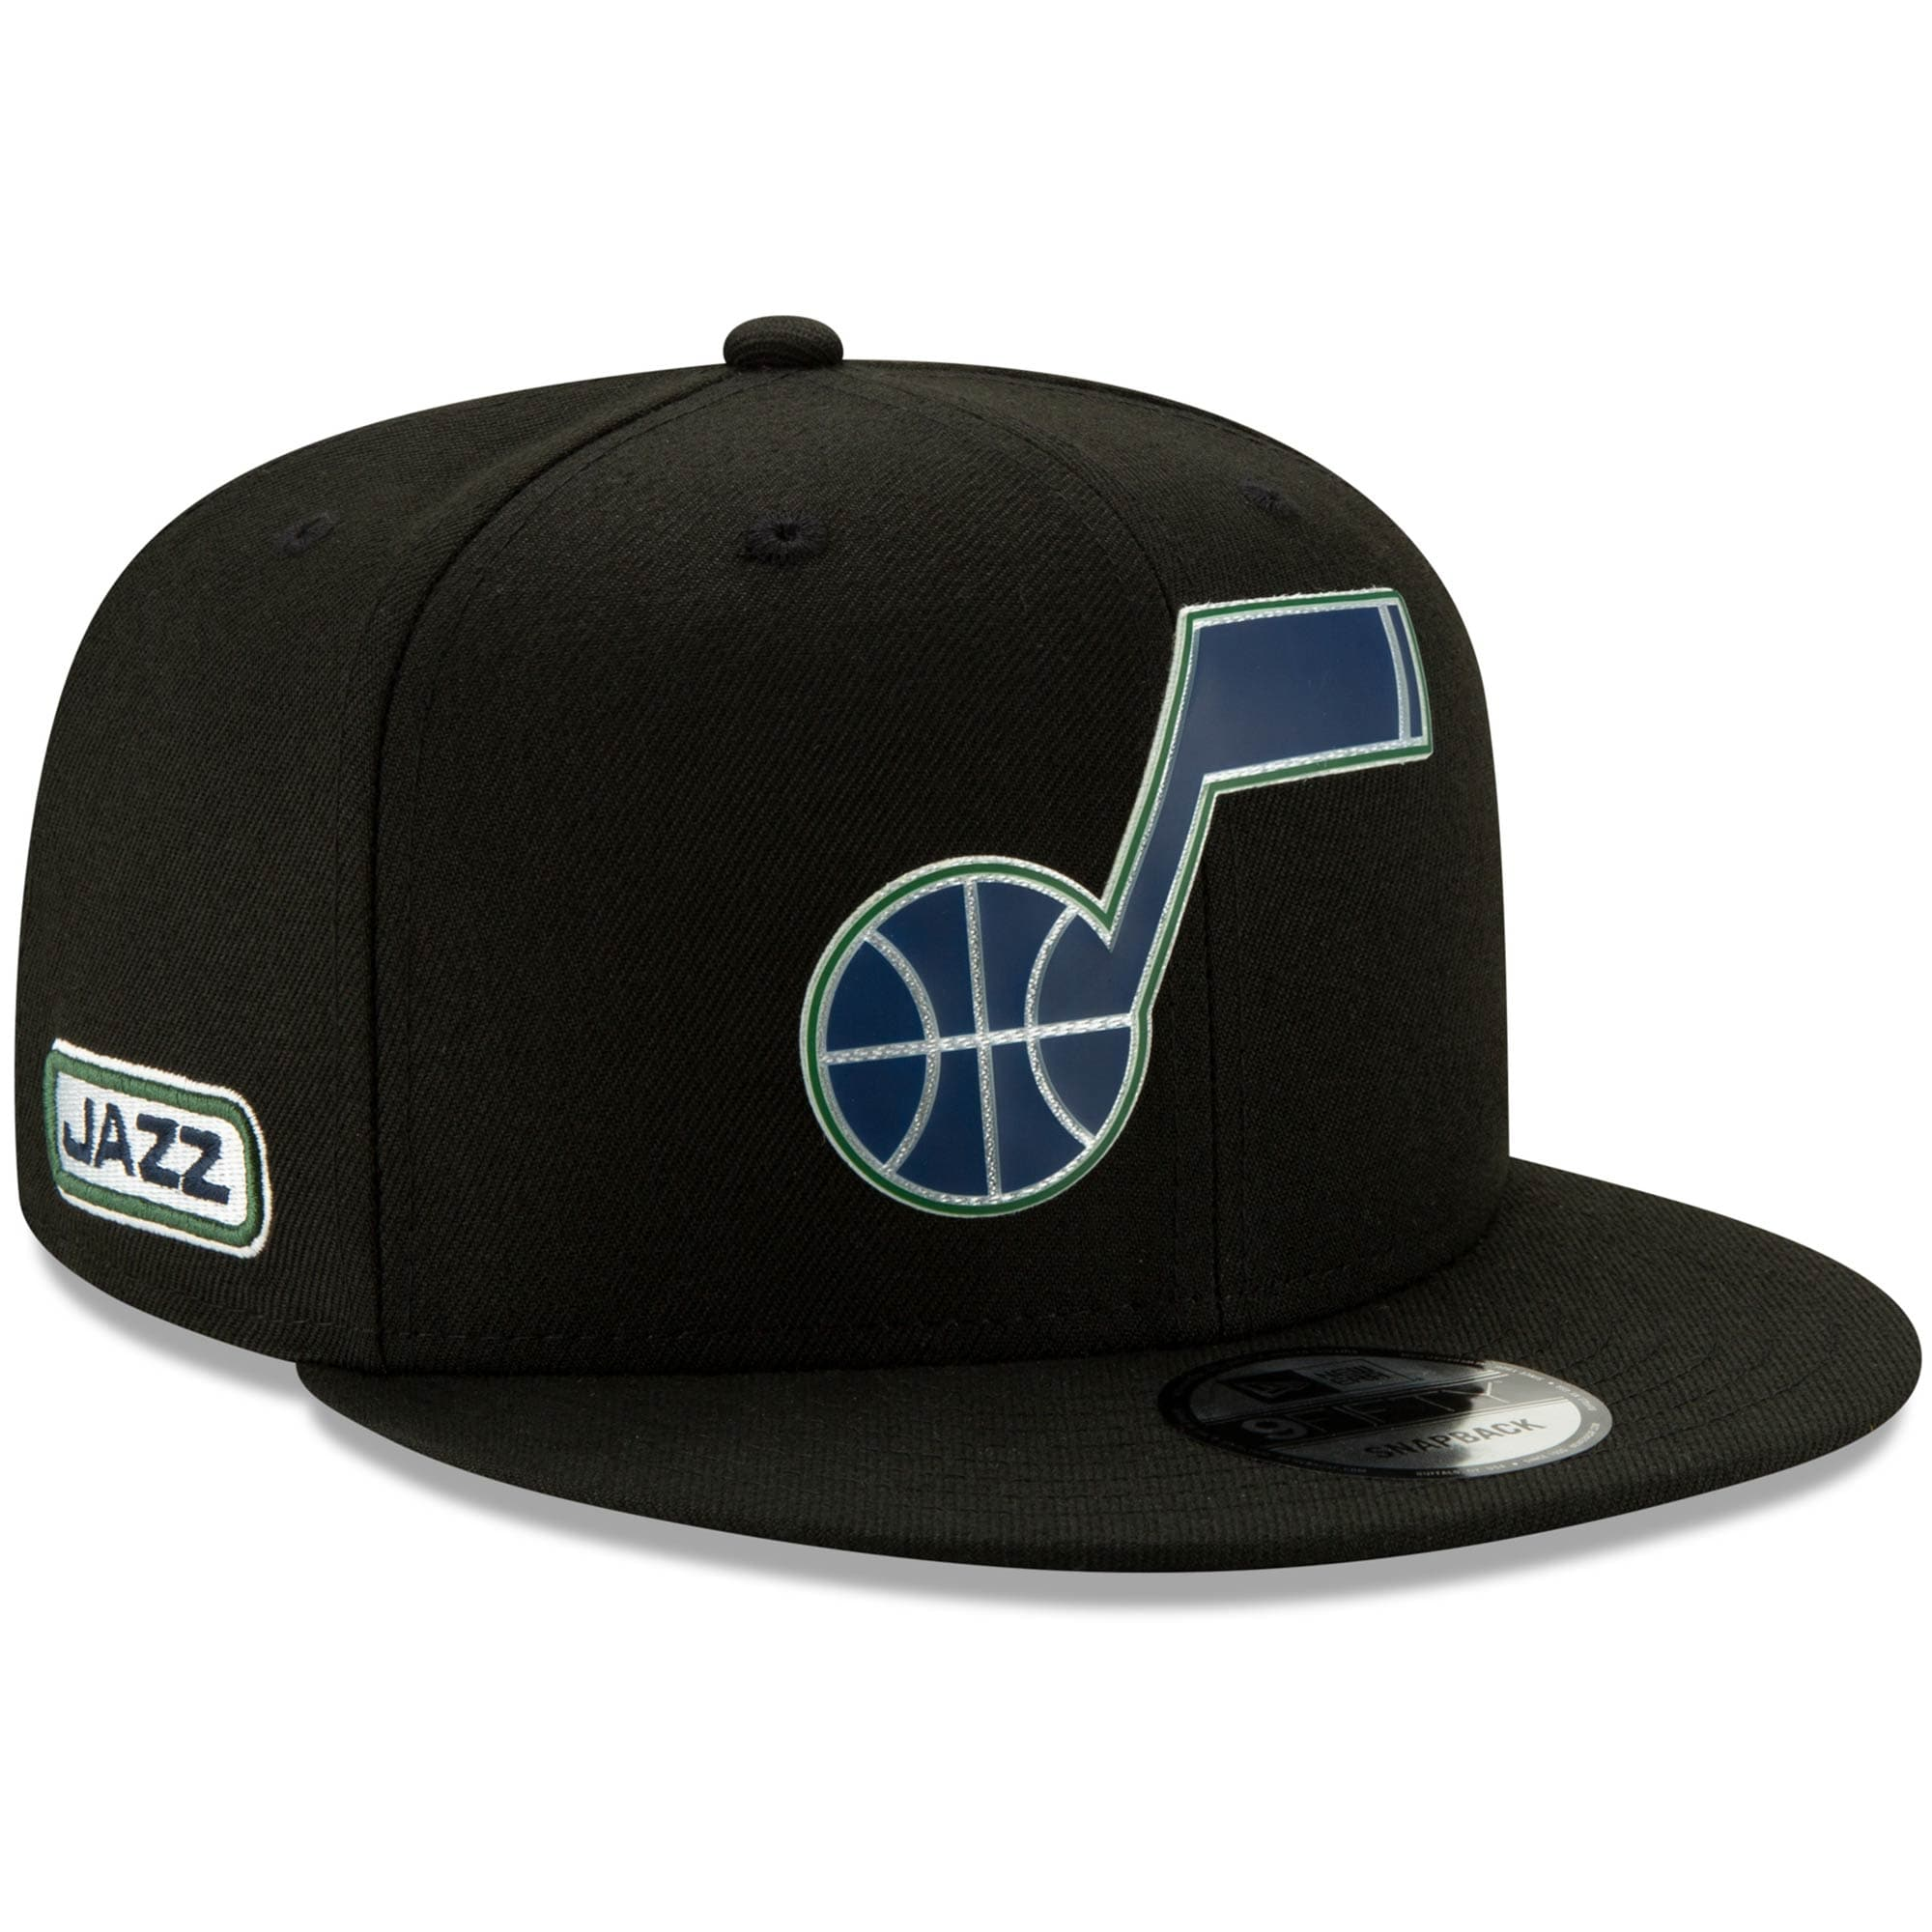 Utah Jazz New Era Official Back Half 9FIFTY Adjustable Snapback Hat - Black